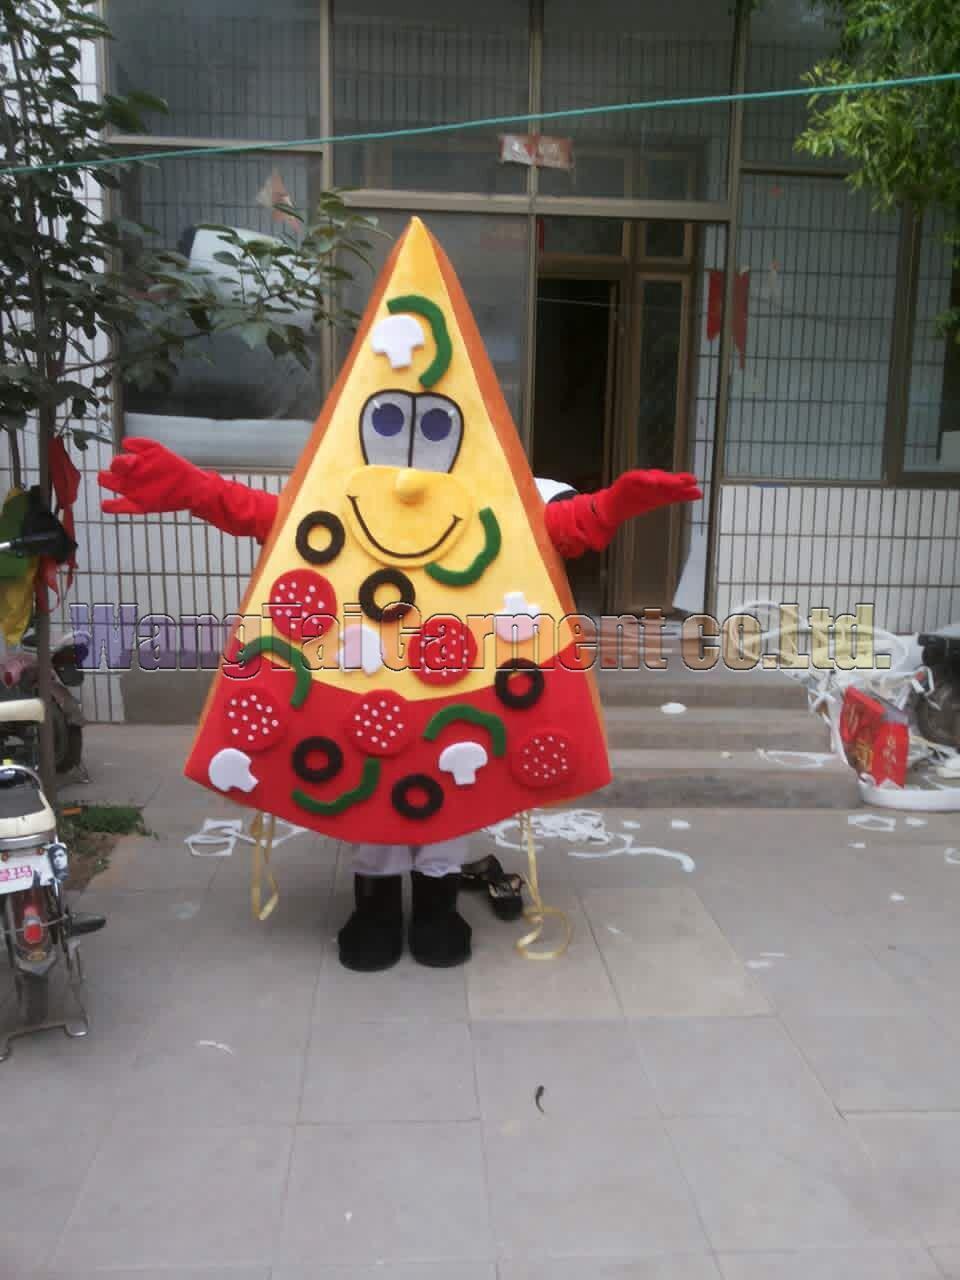 New Pizza mascote da classe Top traje trajes de personagens de banda desenhada deluxe Pizza mascote traje fantasia vestido de festa de carnaval frete grátis